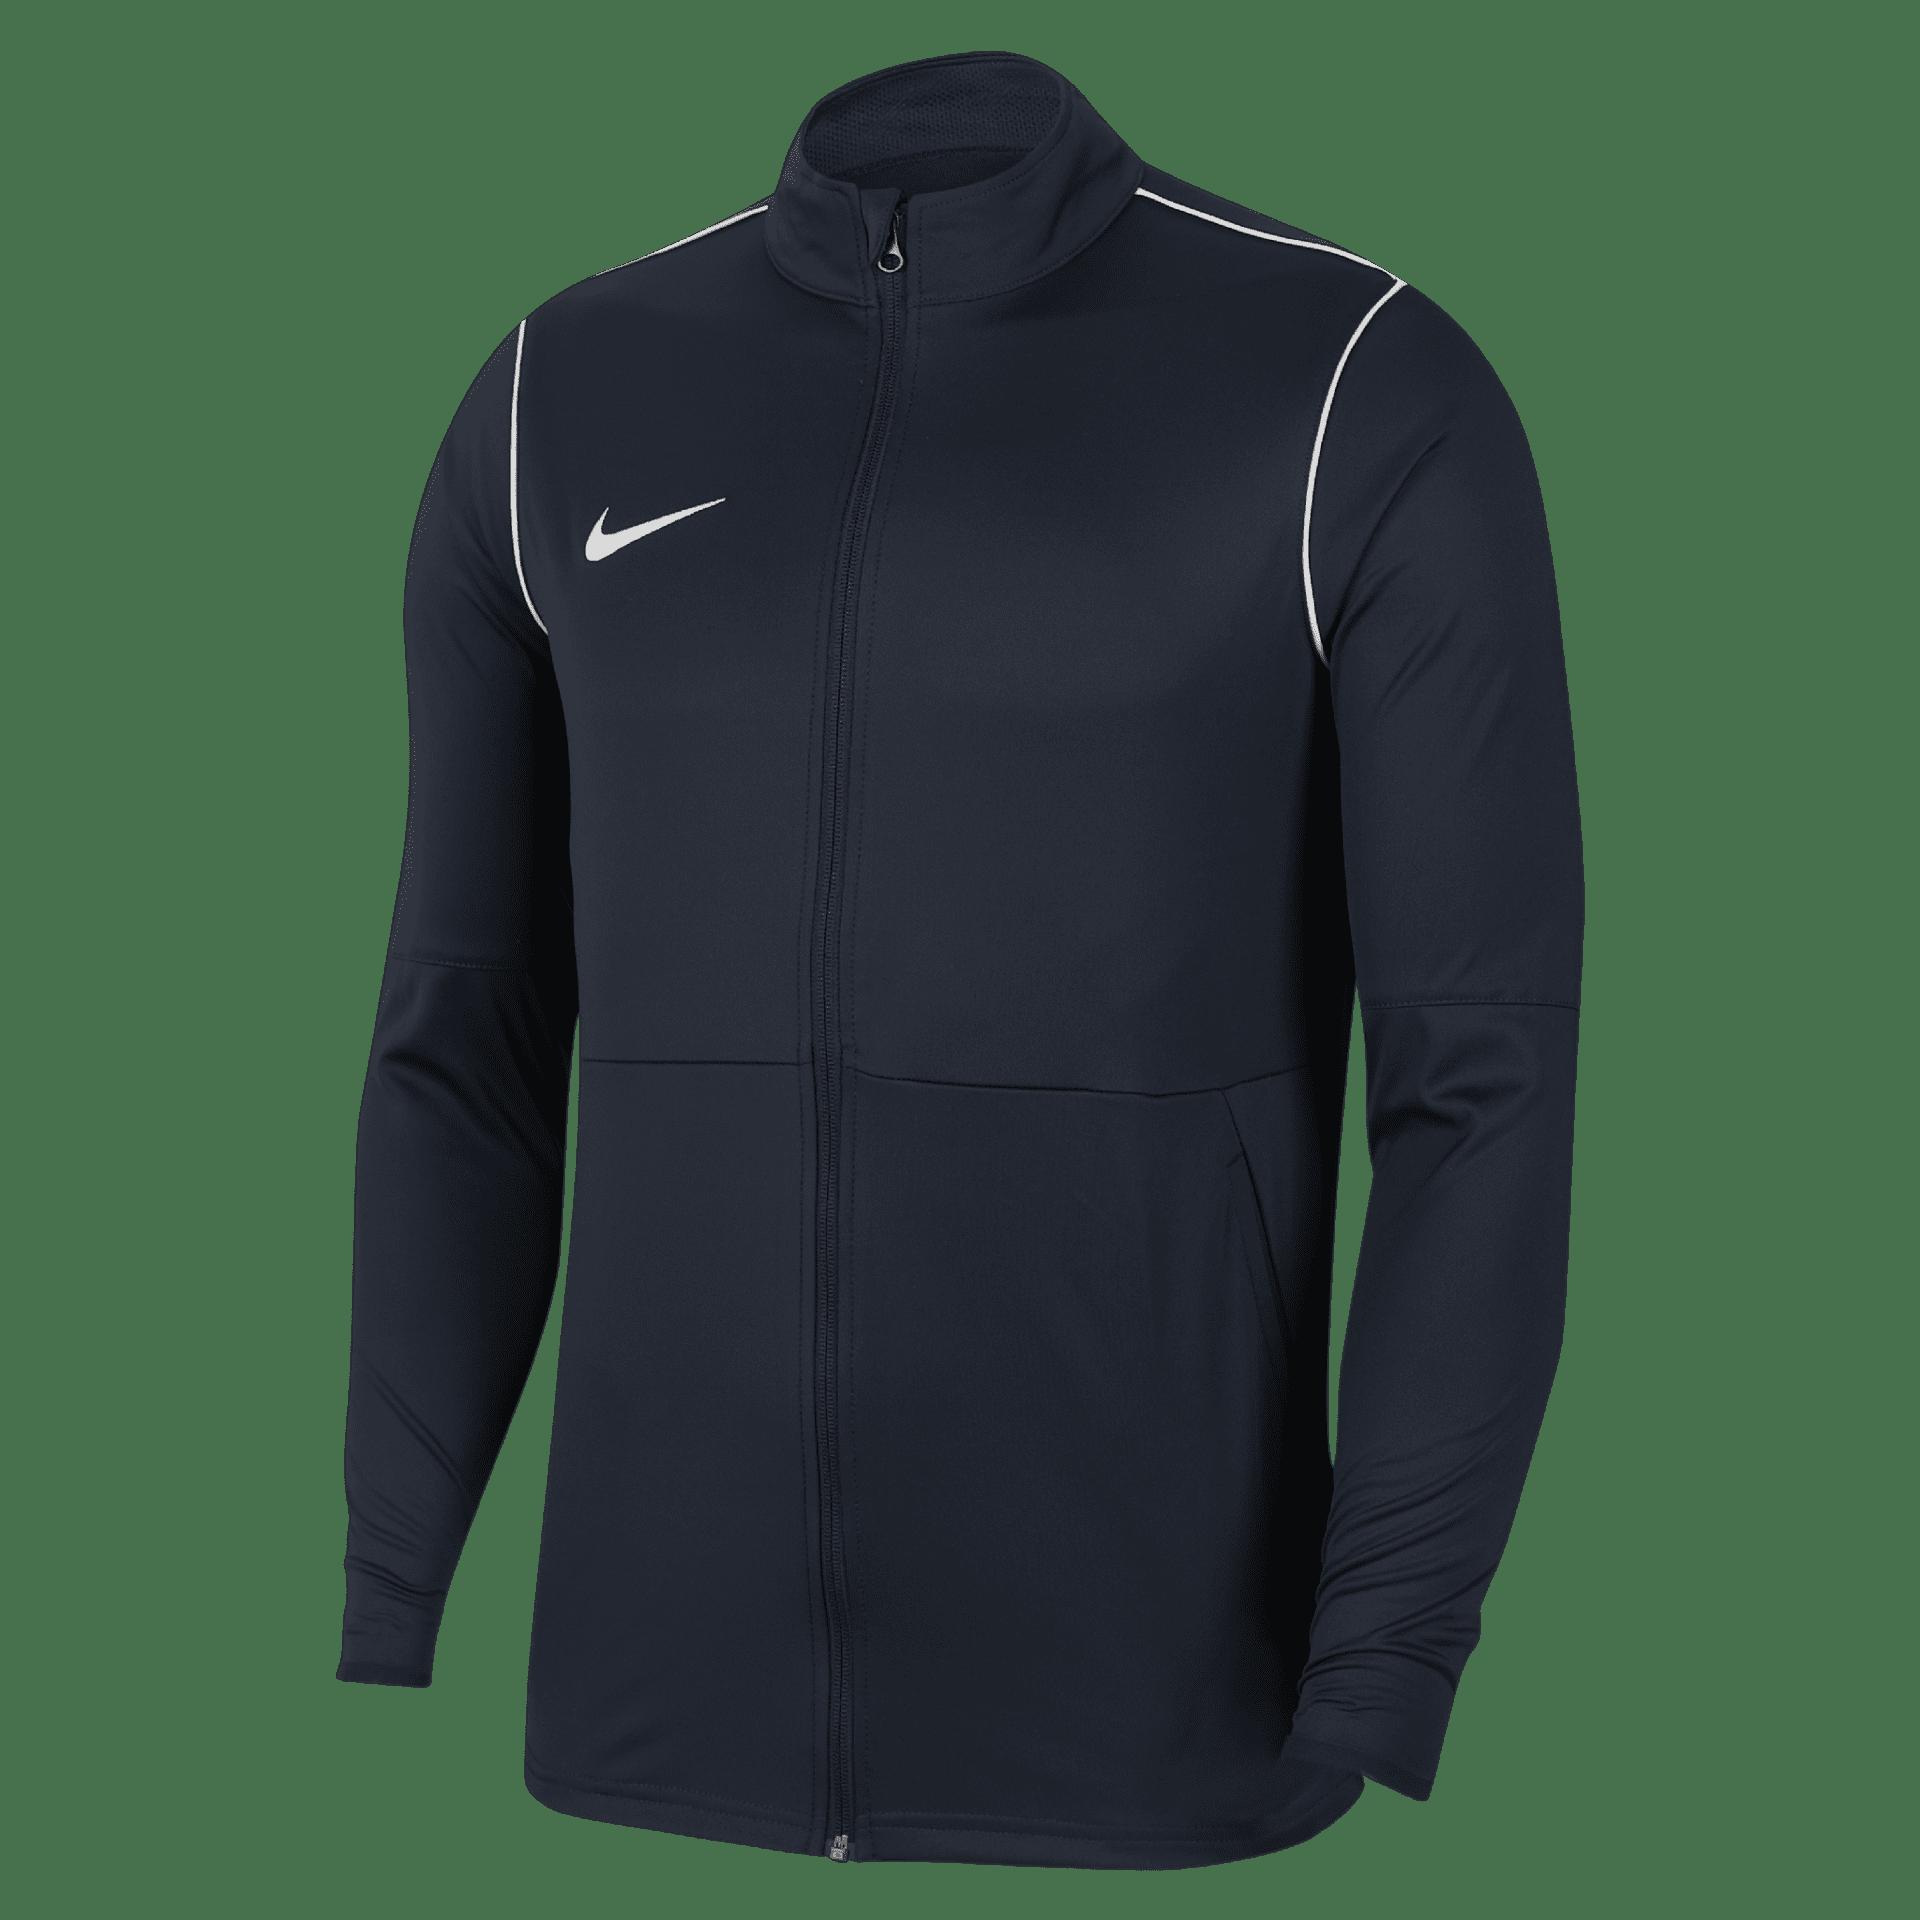 nike park 20 knit track jacket size xxl mens 5 28625 p